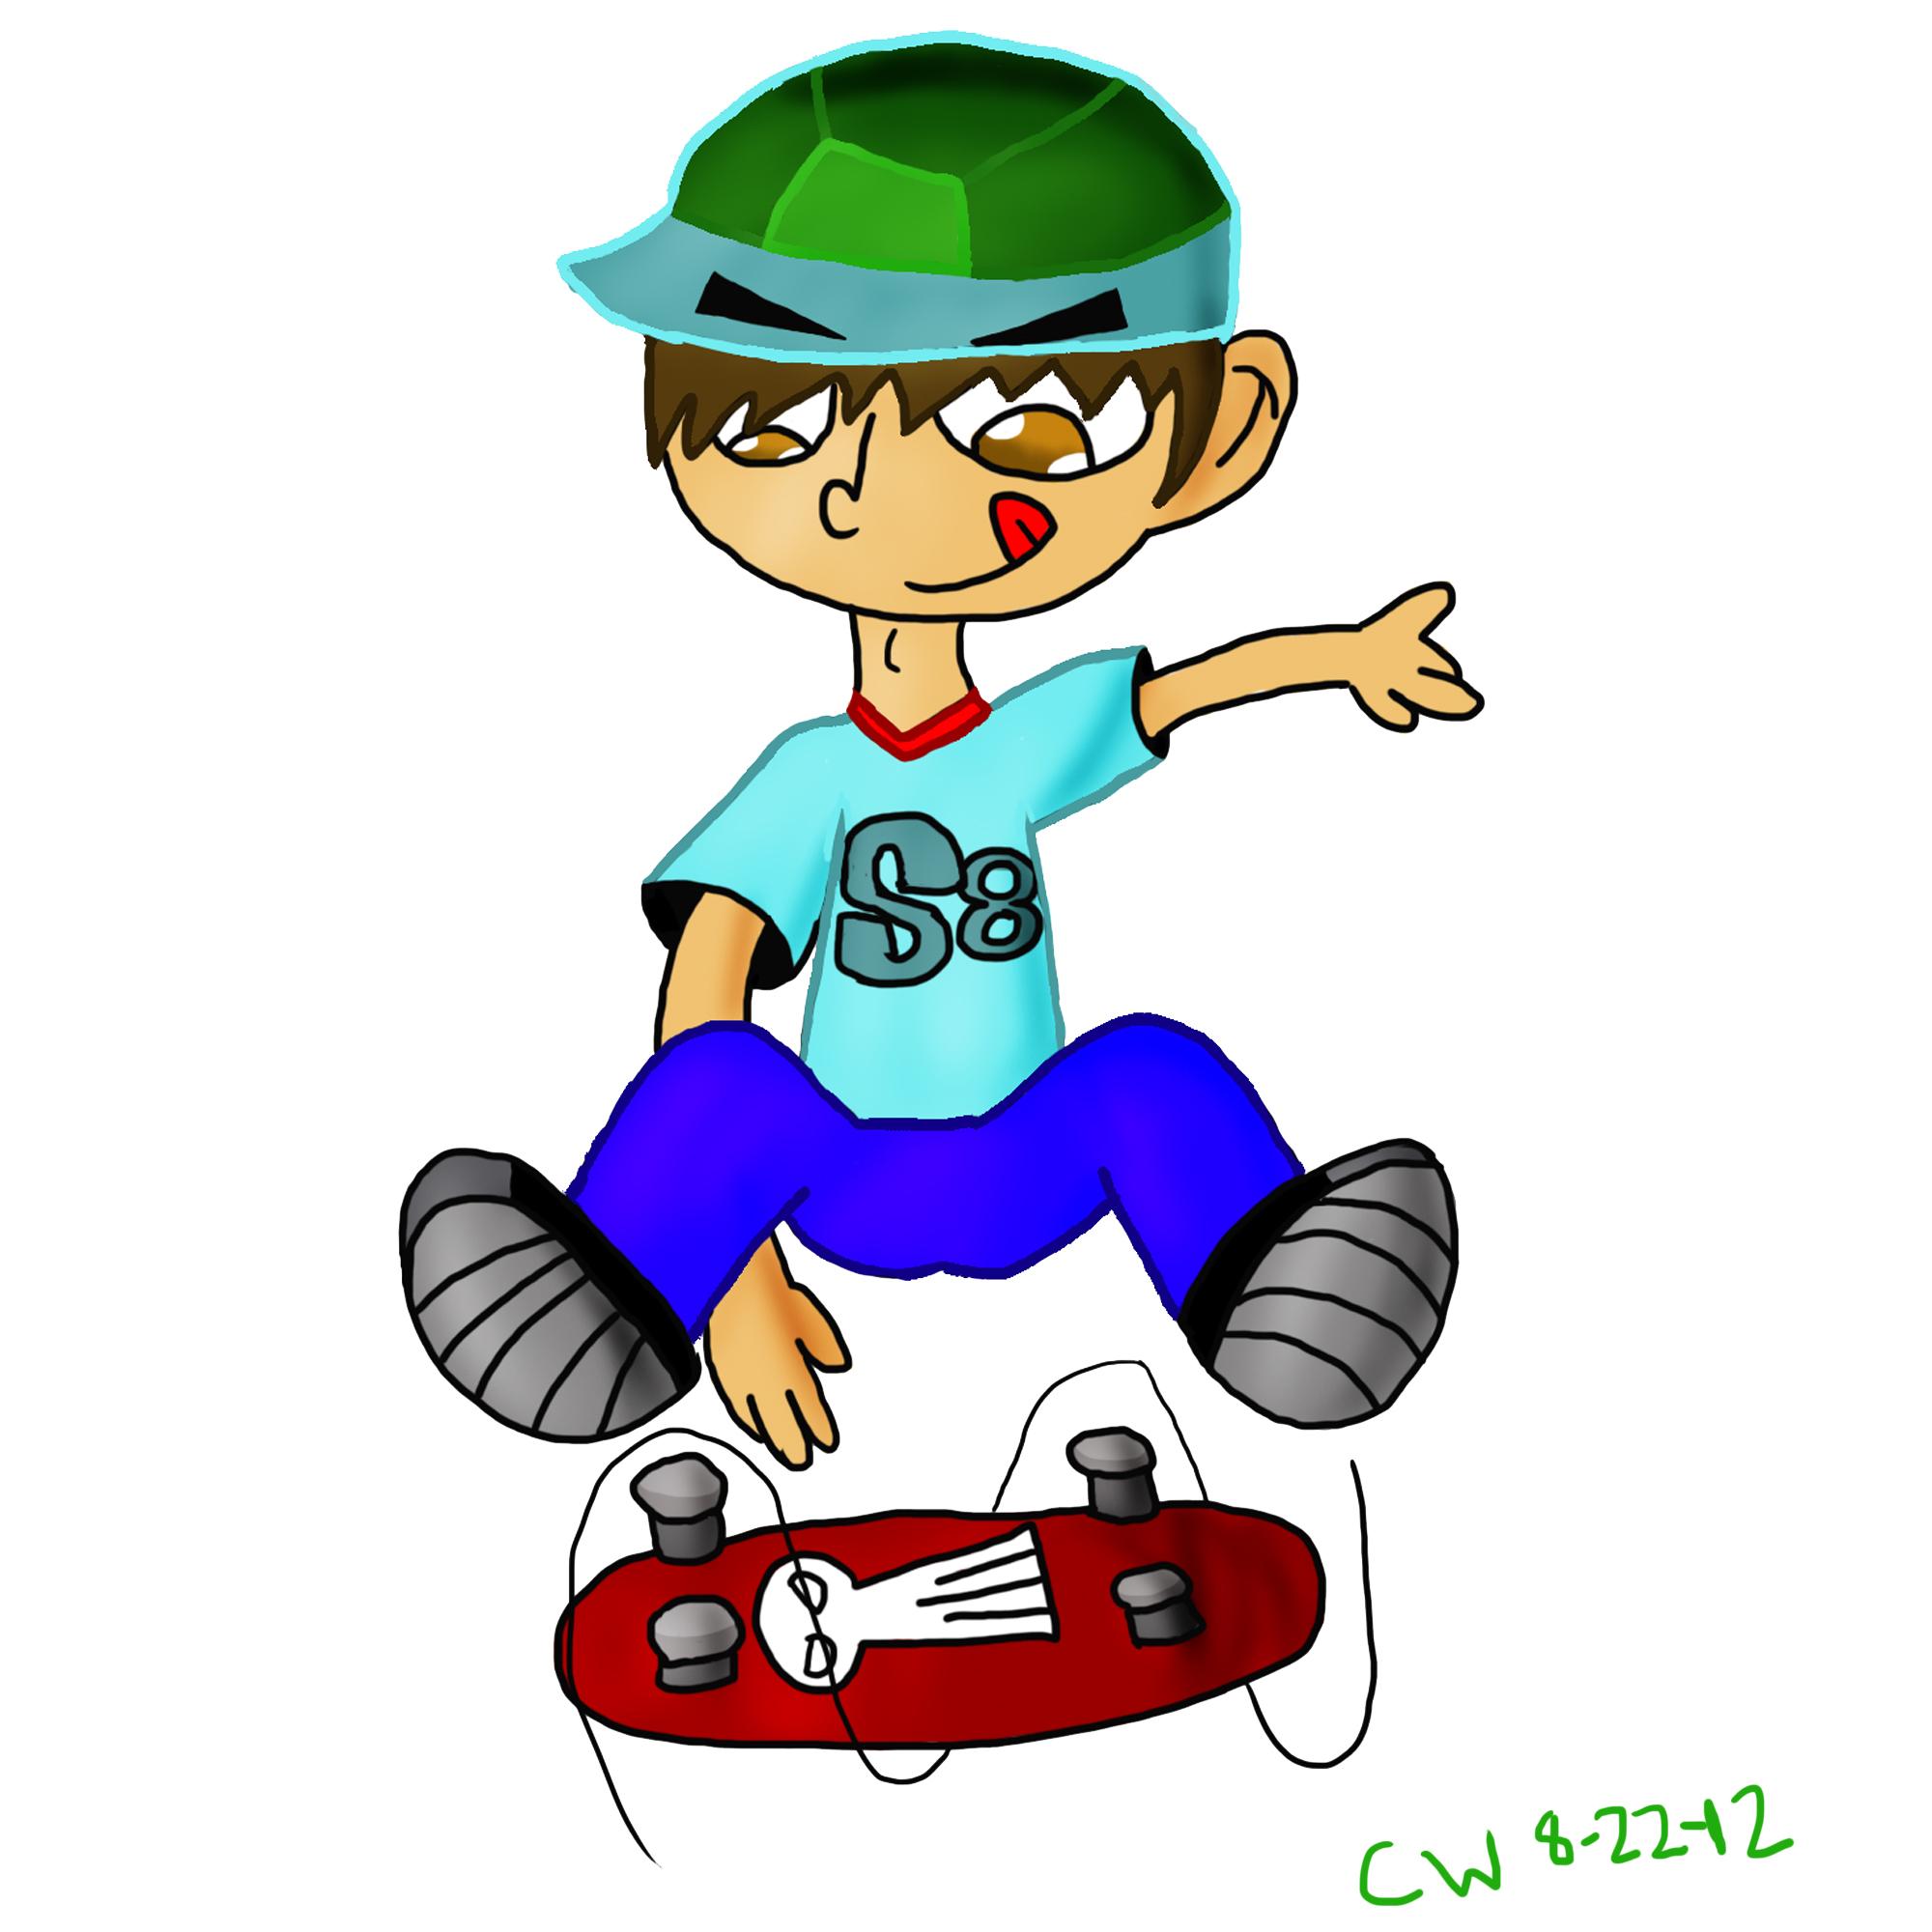 Skater Dude by MozartProds on DeviantArt